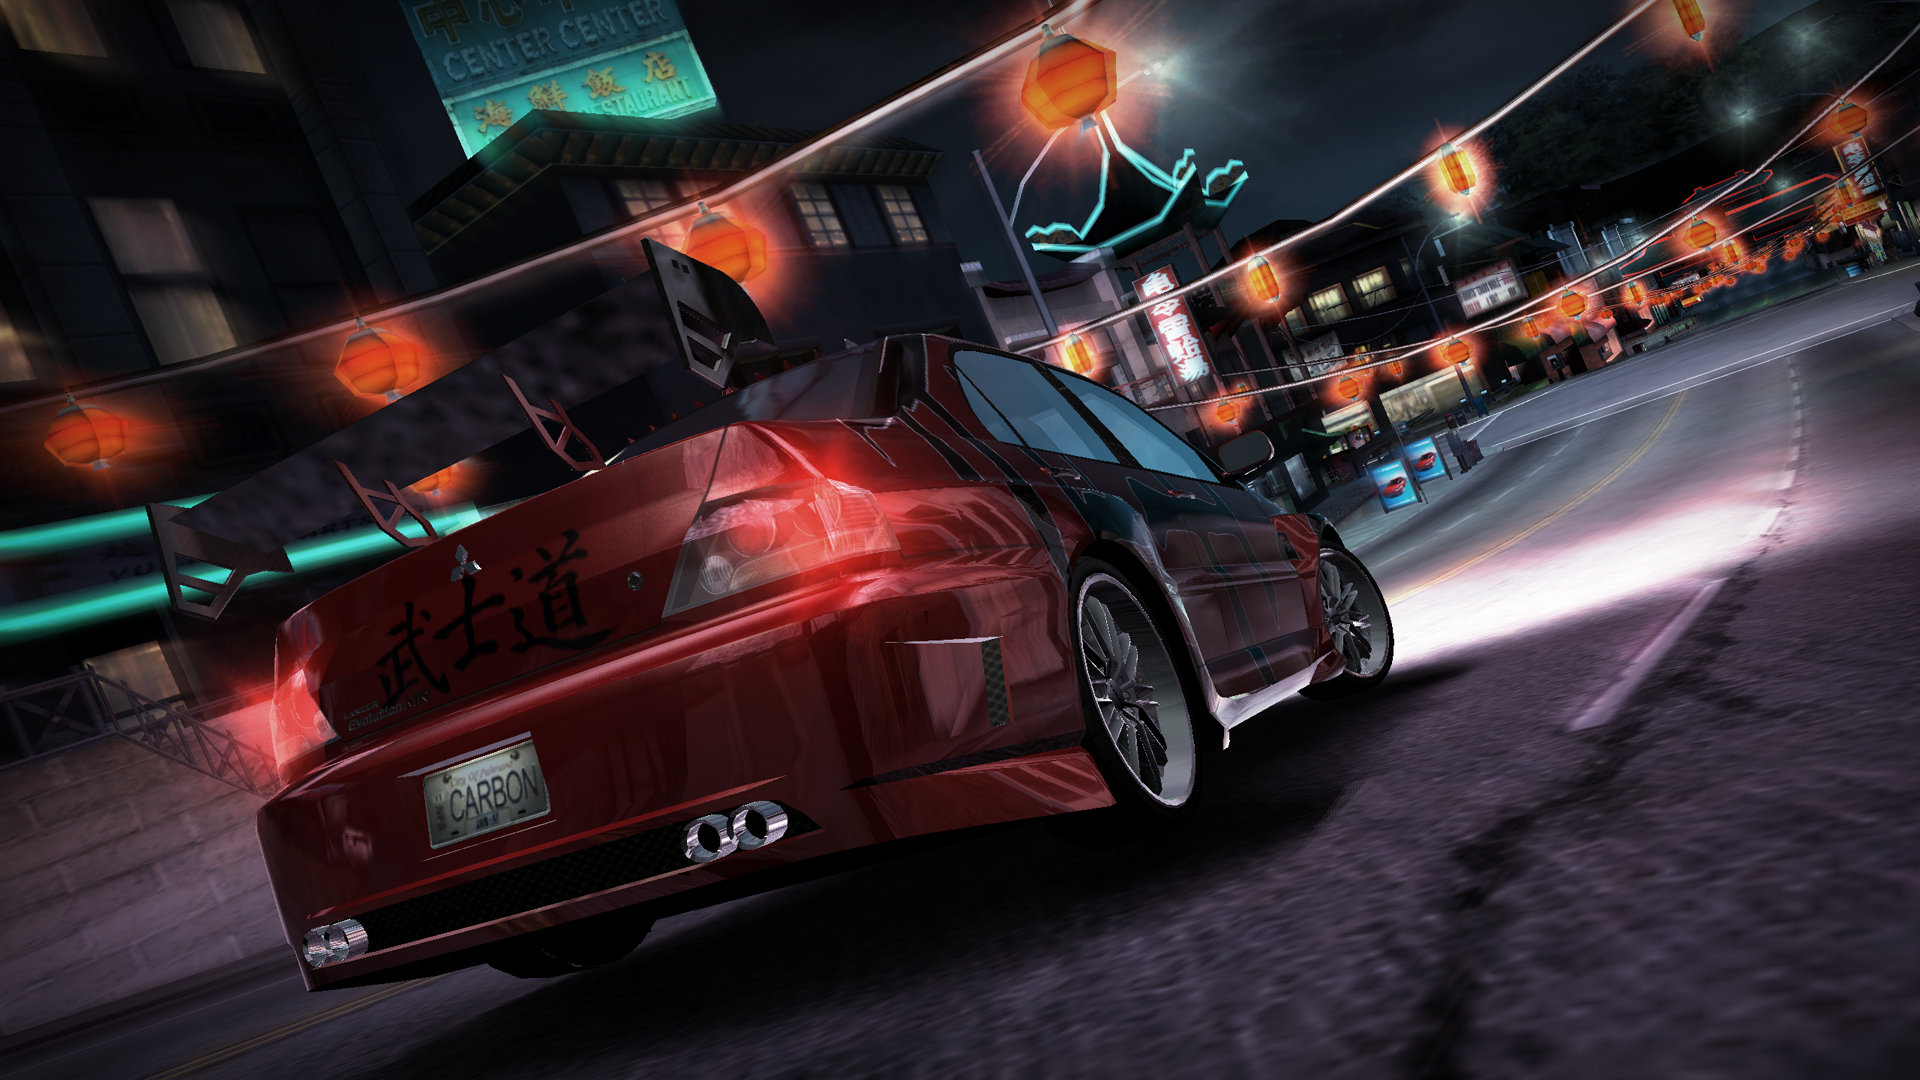 Descargar Need For Speed Carbono / Zofti - Descargas gratis